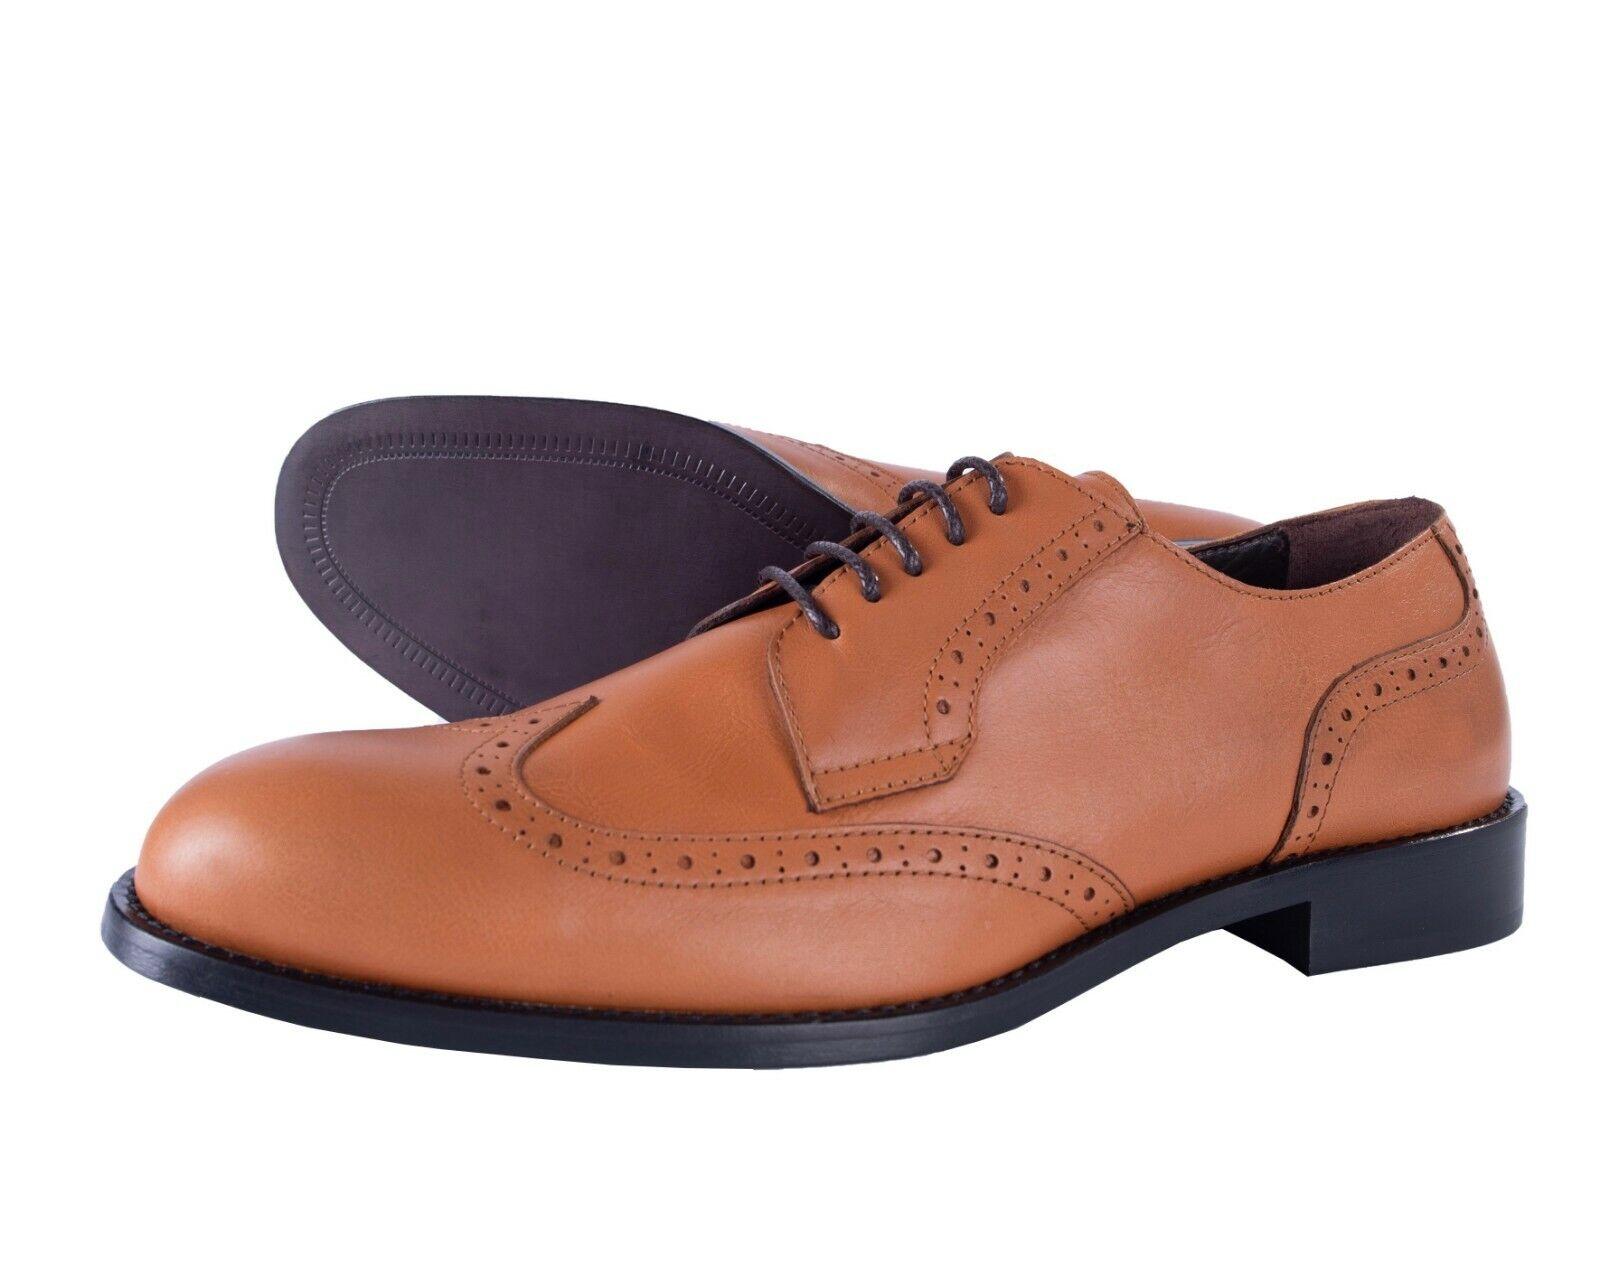 Bcouriro Magli Chaussures Bout D'Aile Richelieu à Cedar Cuir Luxe Italie 43 10 US